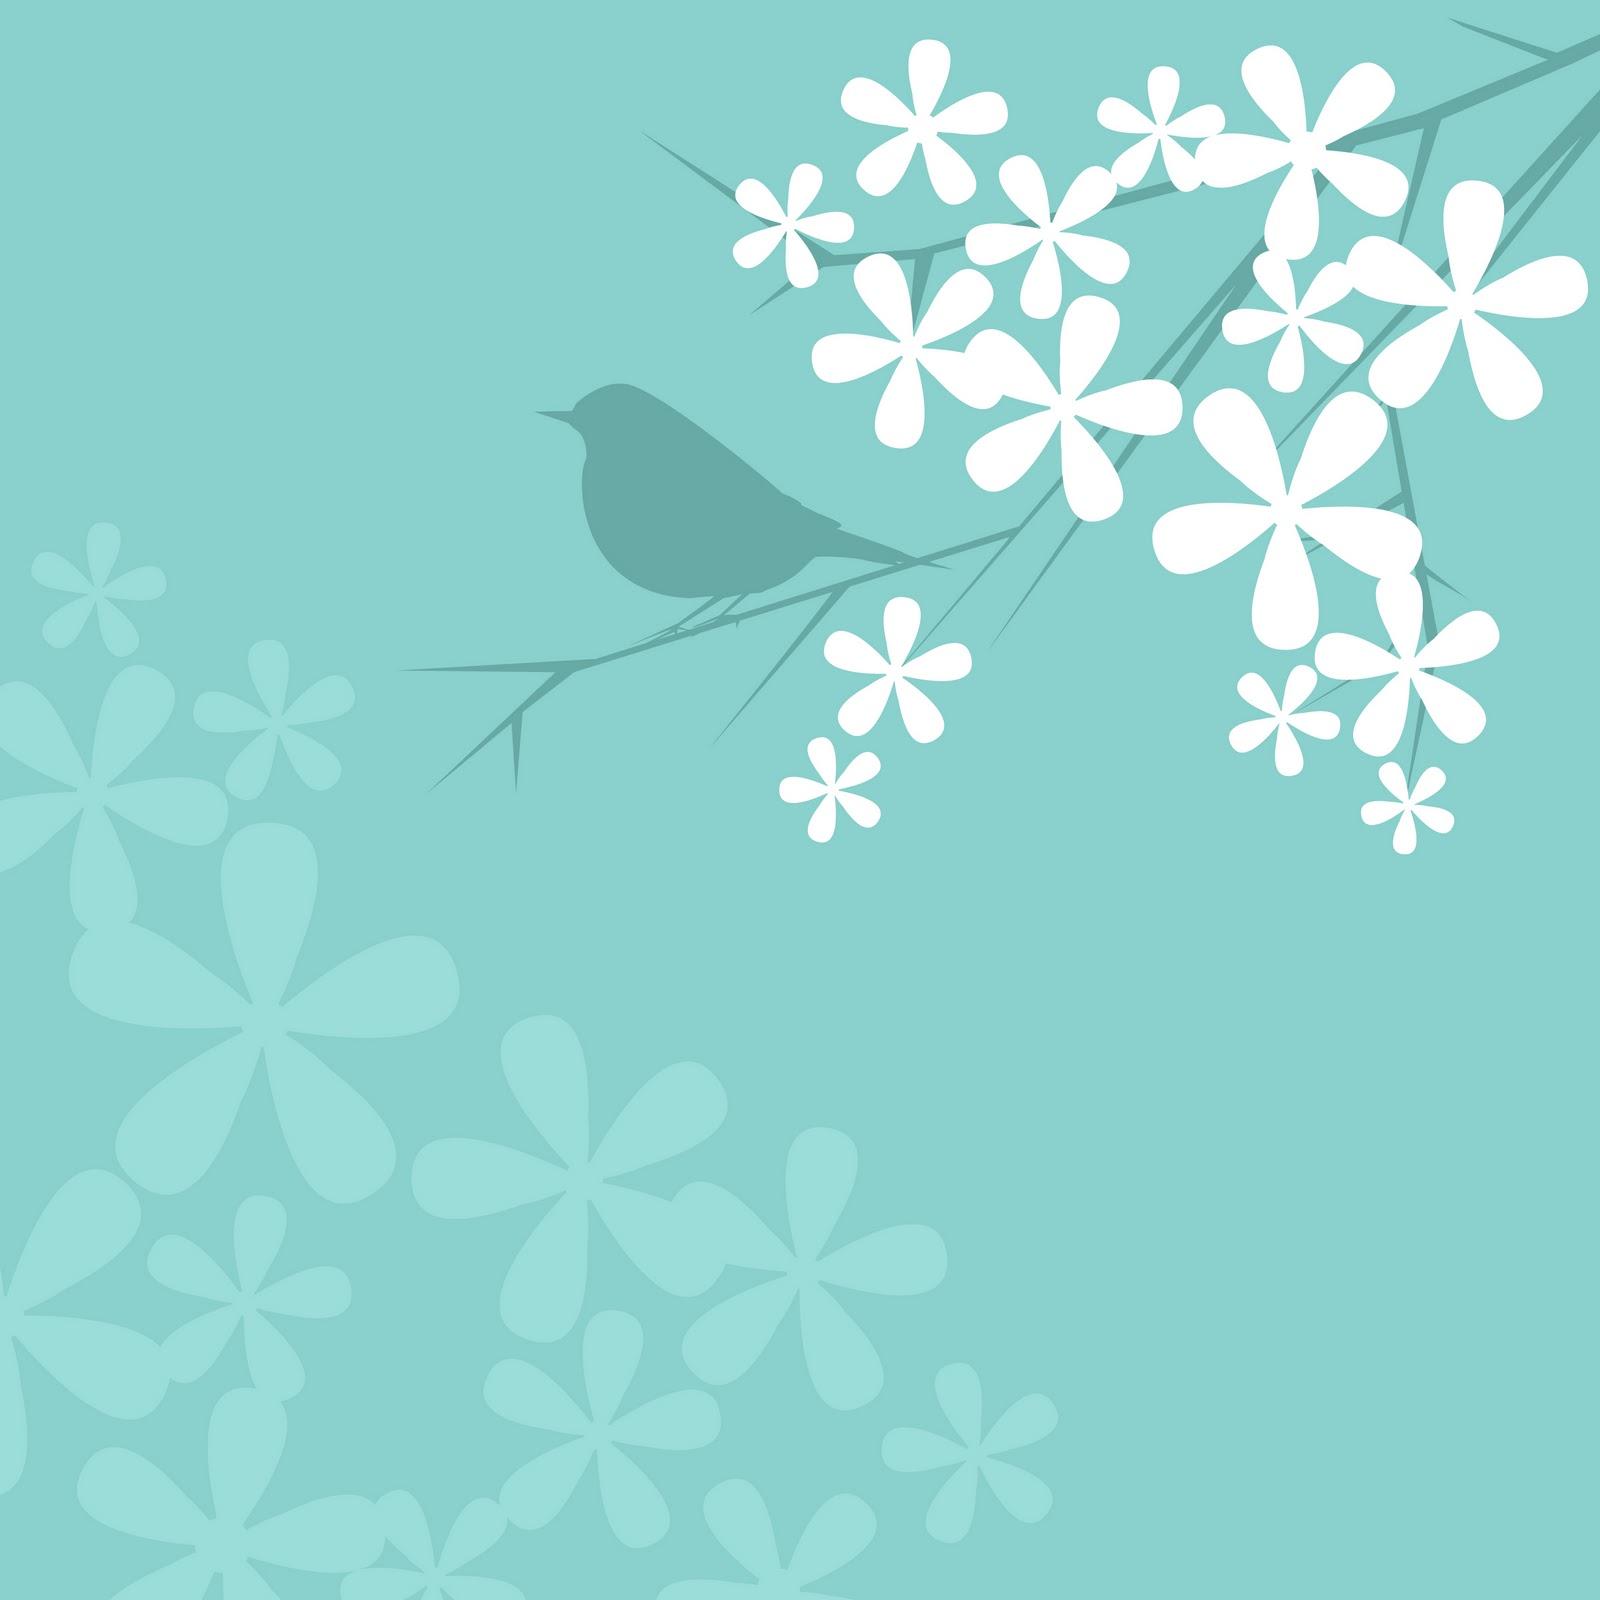 Pretty Blue Backgrounds - WallpaperSafari